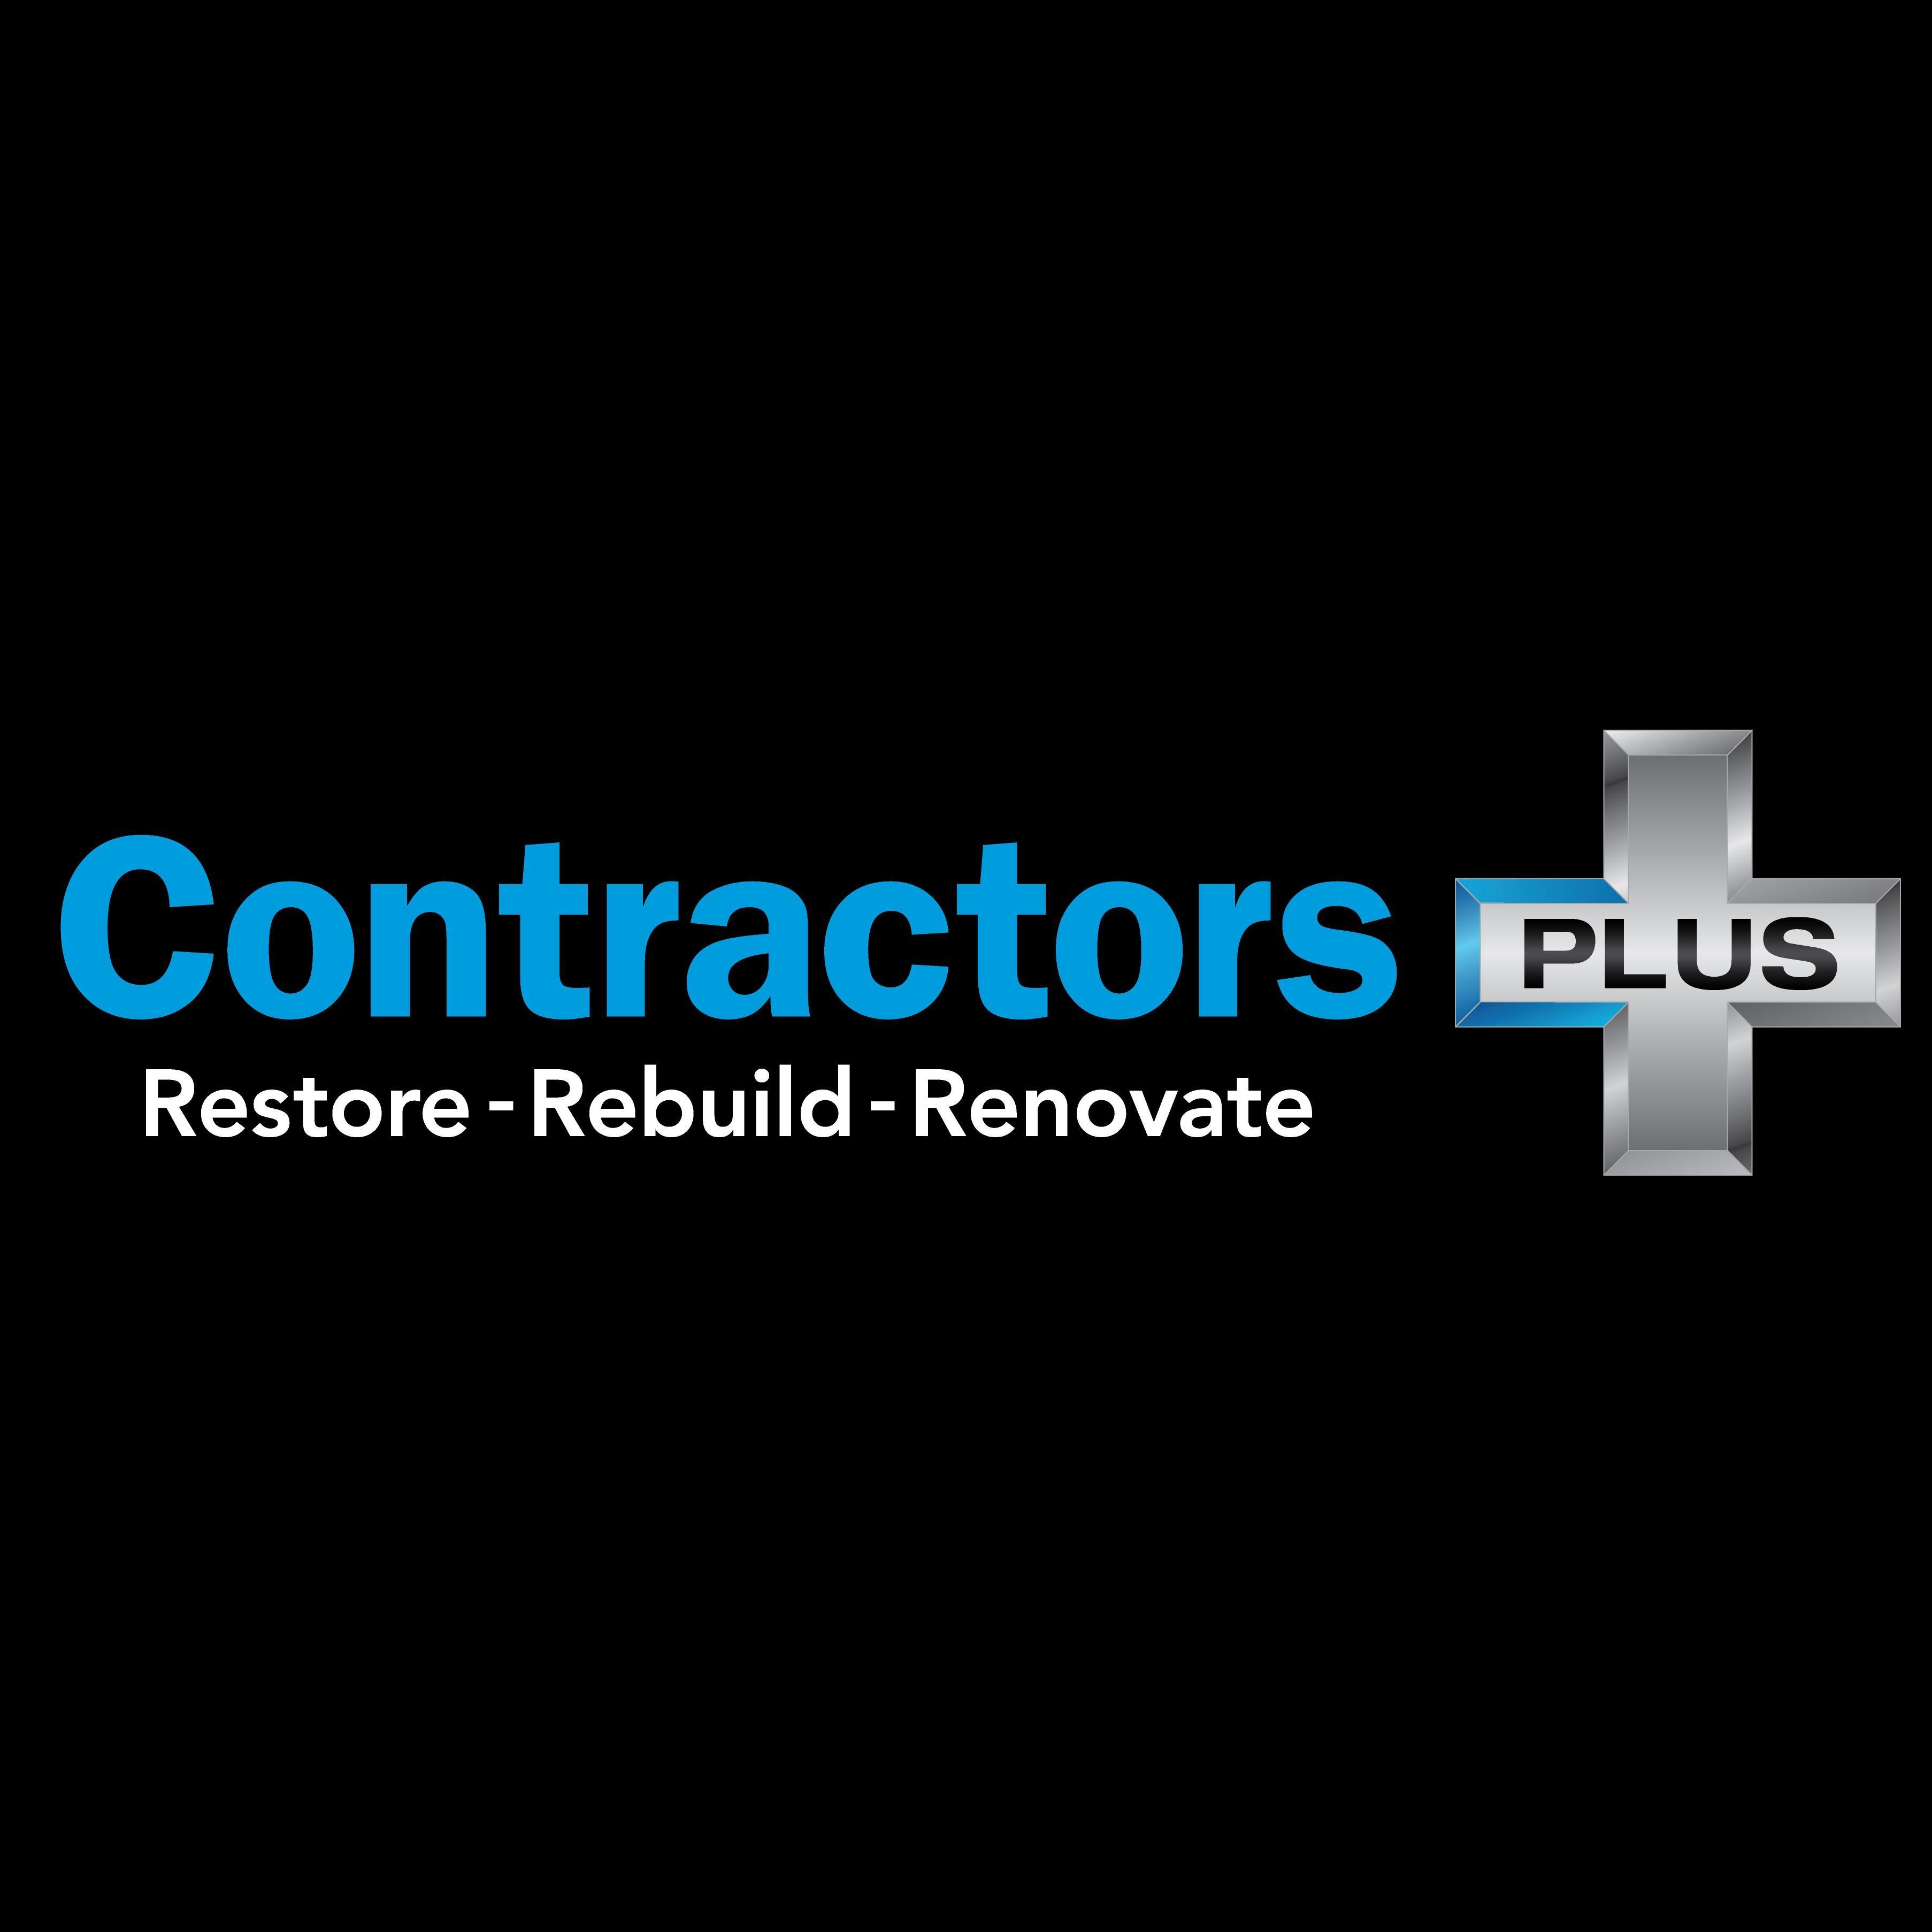 Contractors Plus Inc